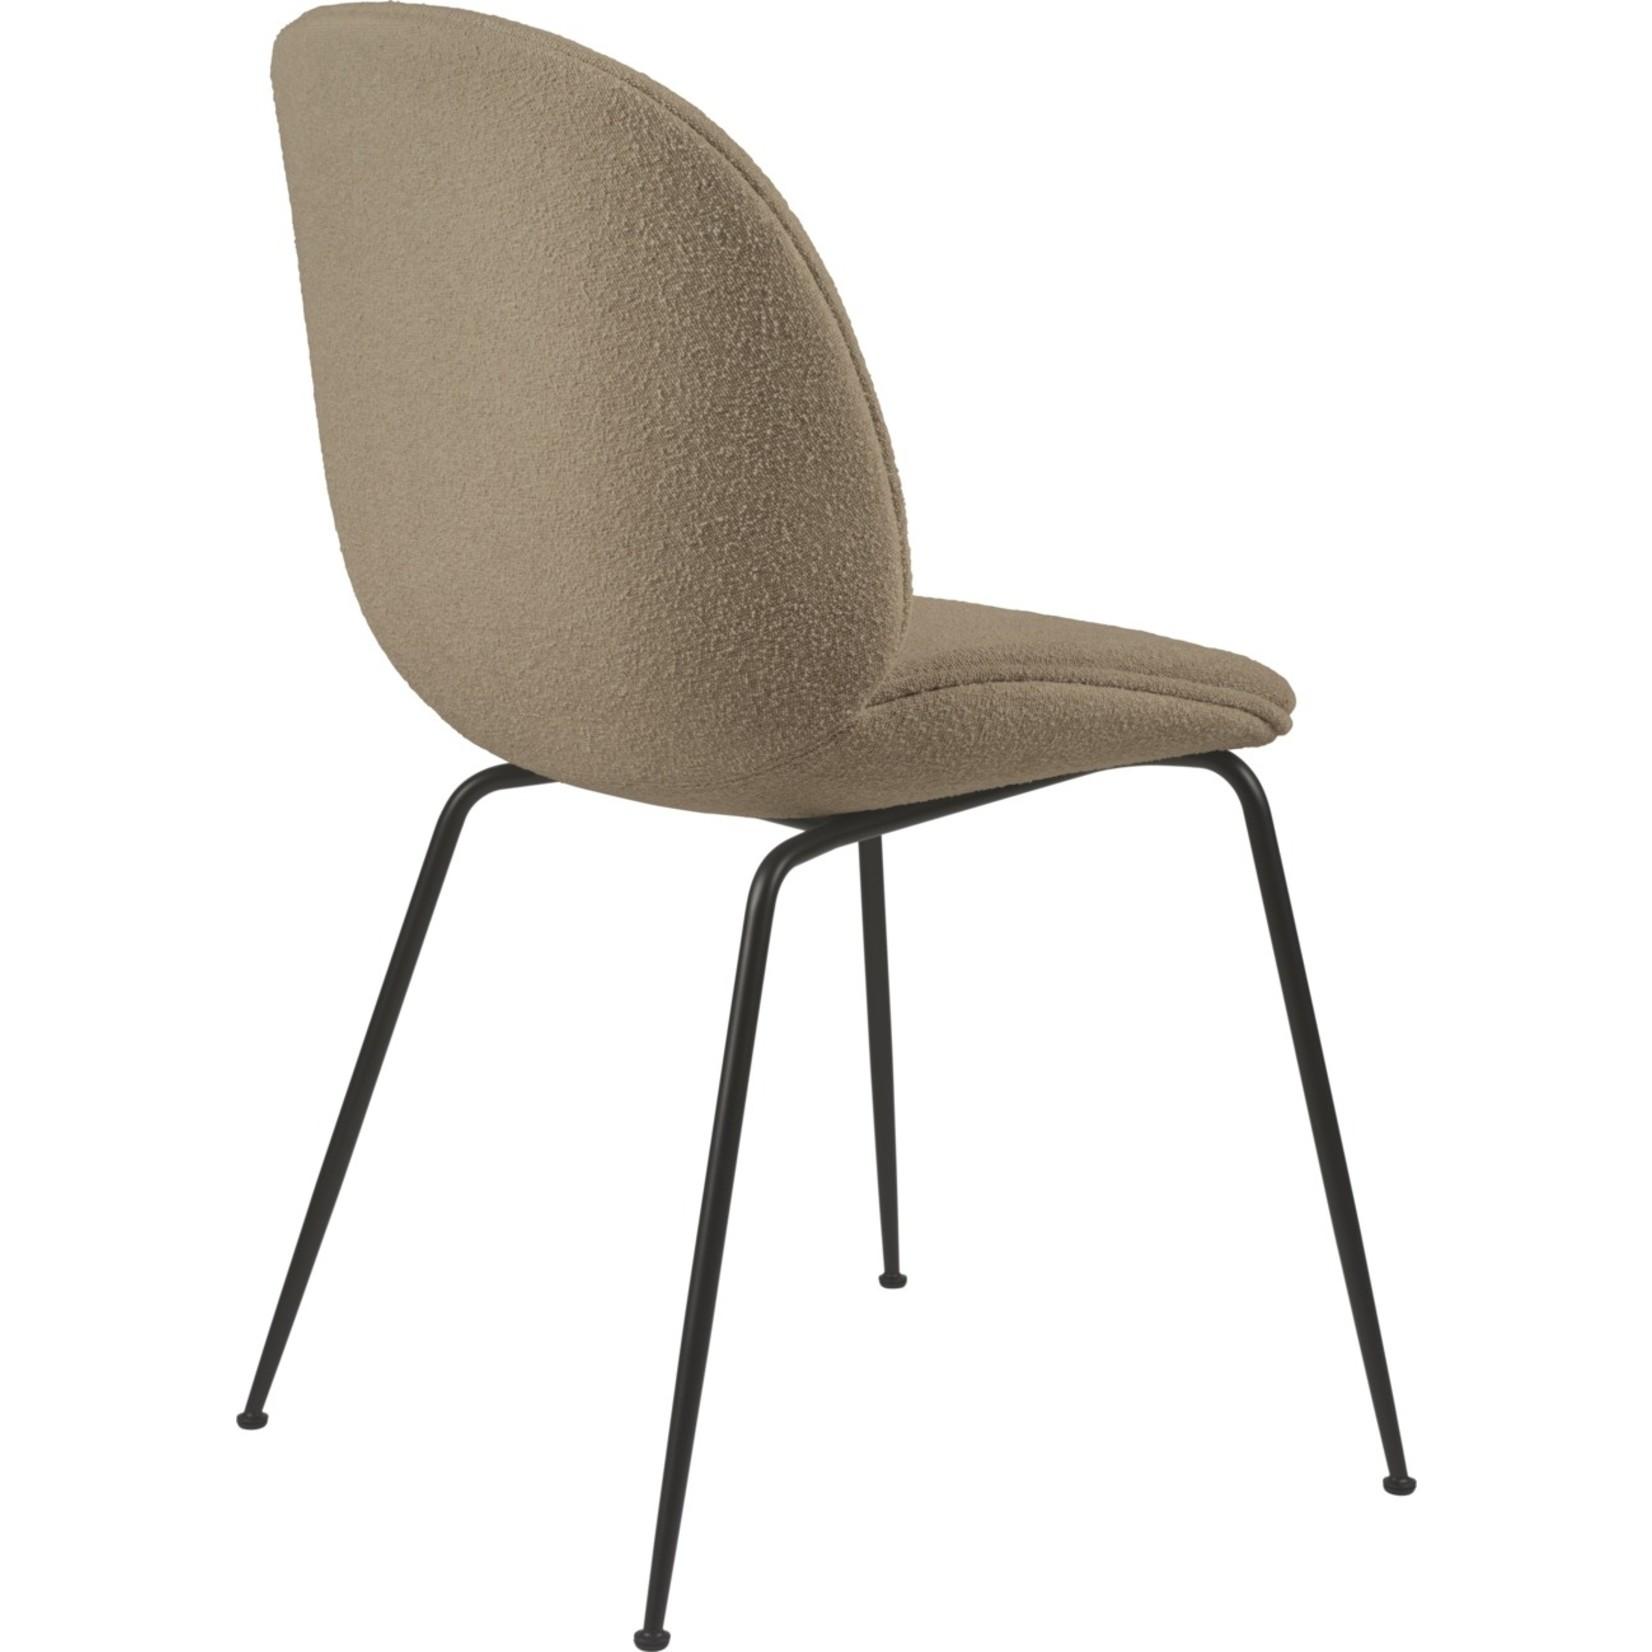 Gubi Beetle Dining Chair | Light Boucle 003 & Black Matt Base